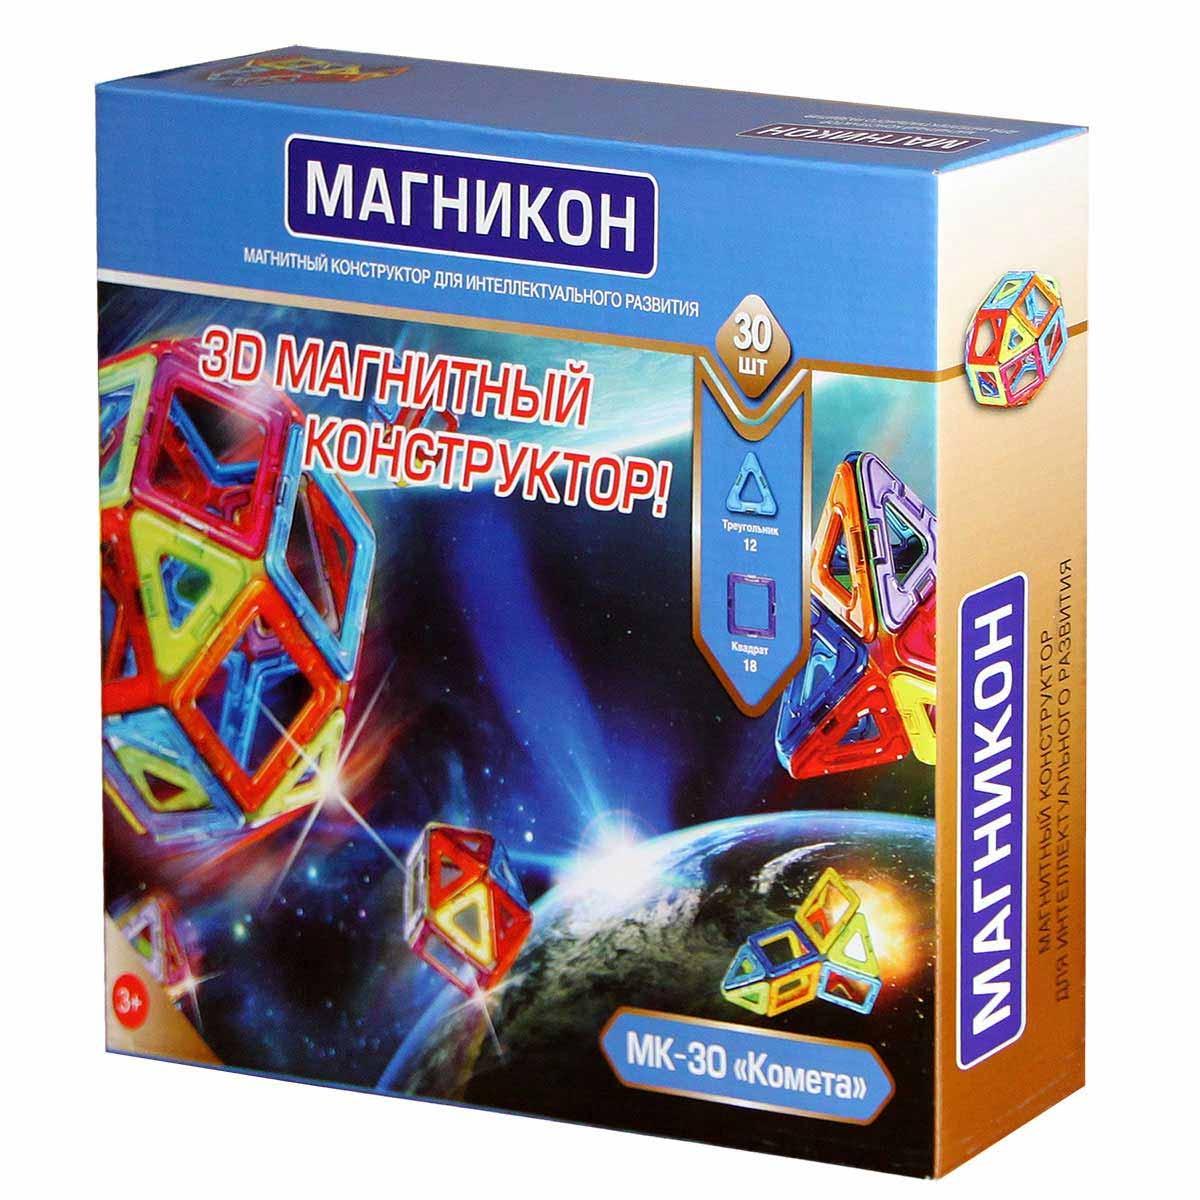 MK-30 Комета Магникон Конструкторы все цены